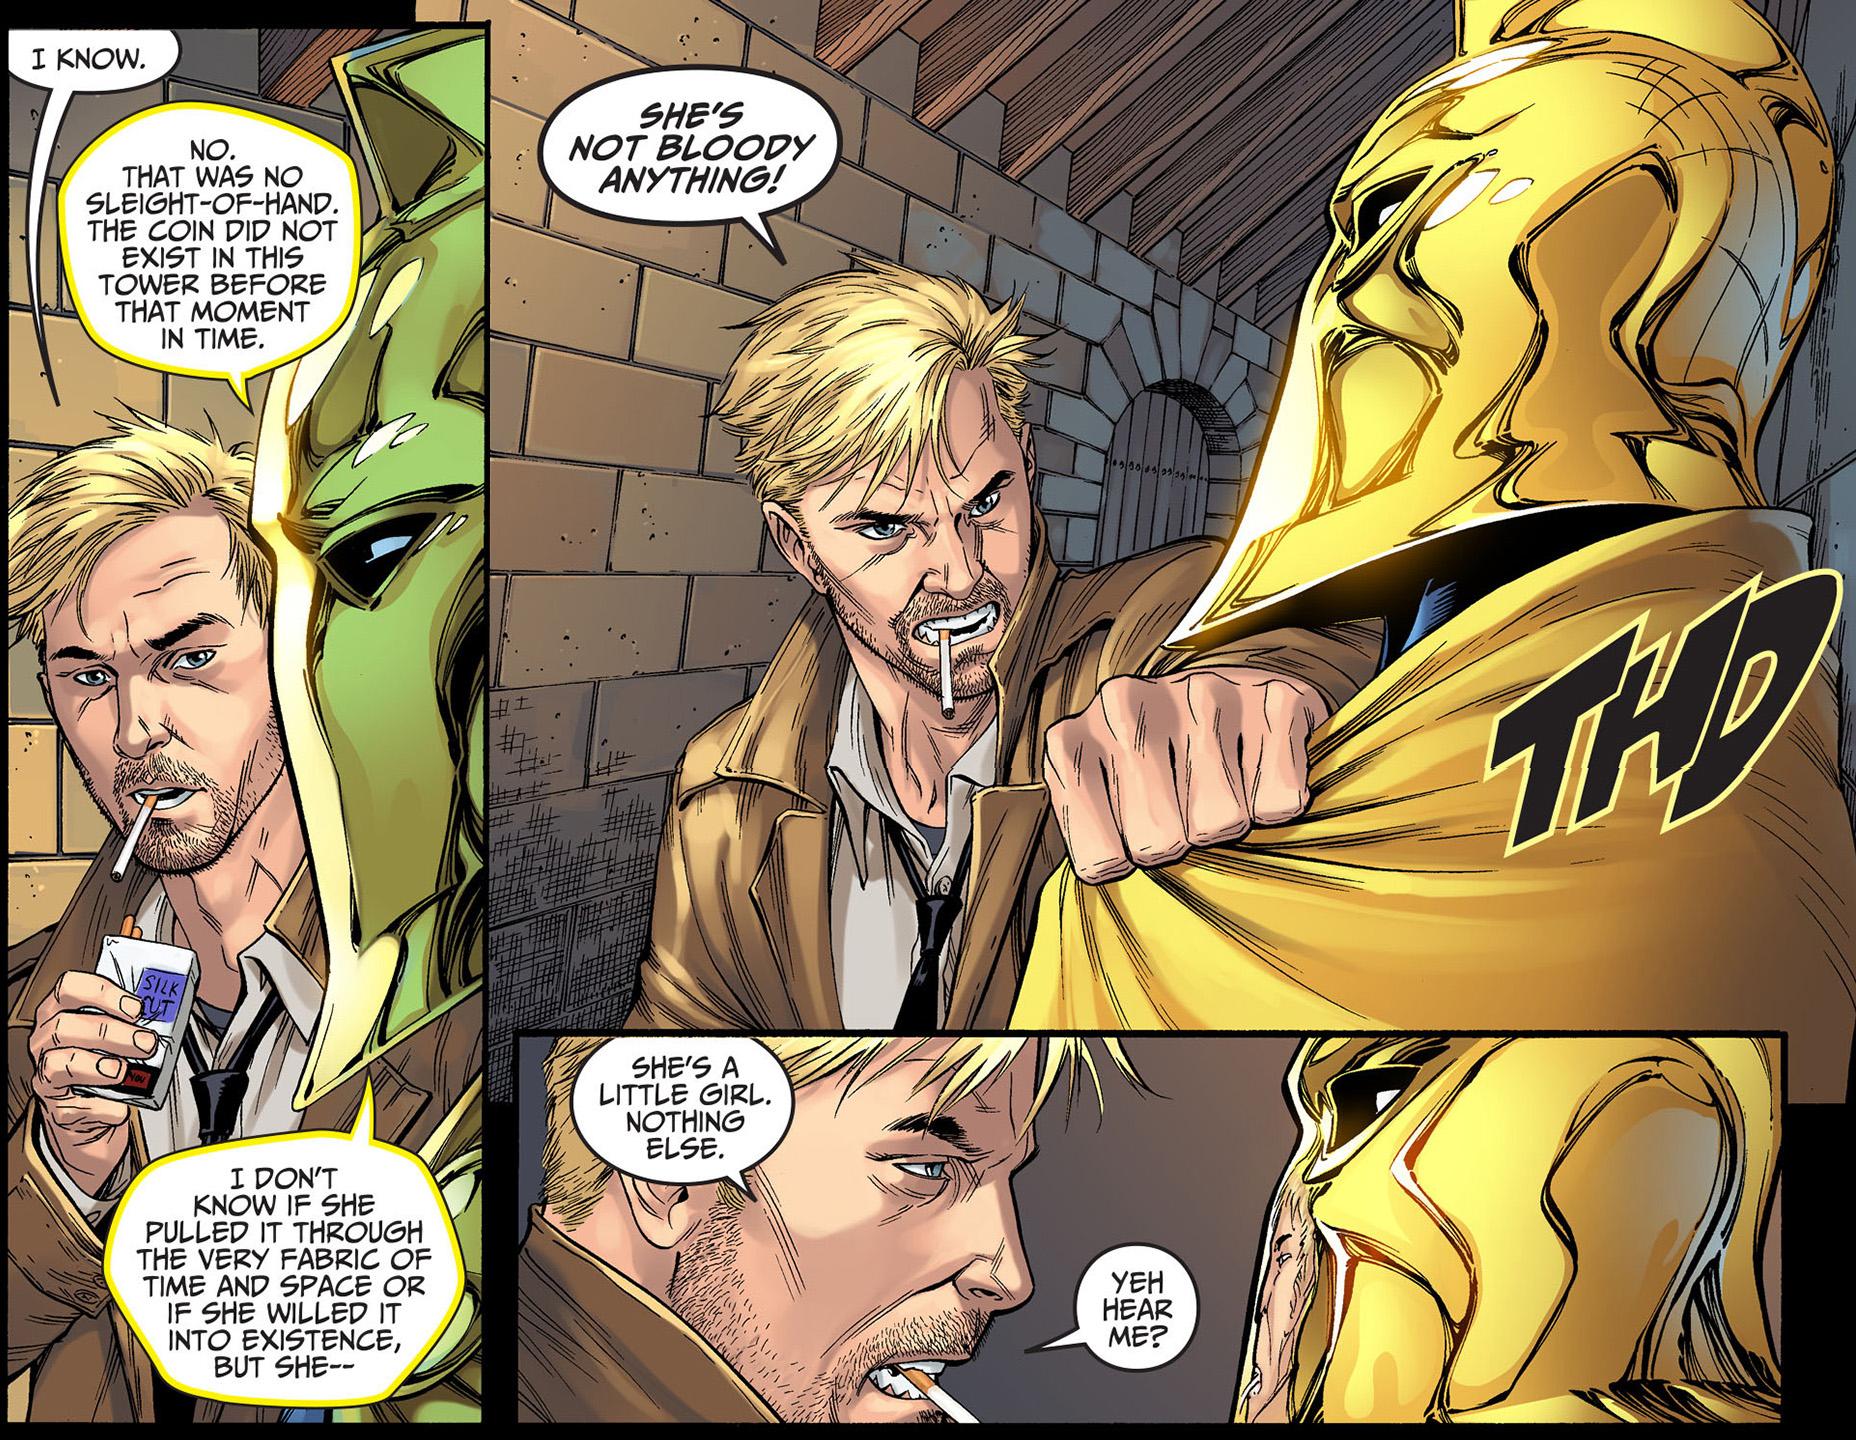 john constantine comic, constantine, hates john constantine, john constantine, john constantine comic, Justice League, Justice League constantine, Justice League Dark, Justice League john constantine,